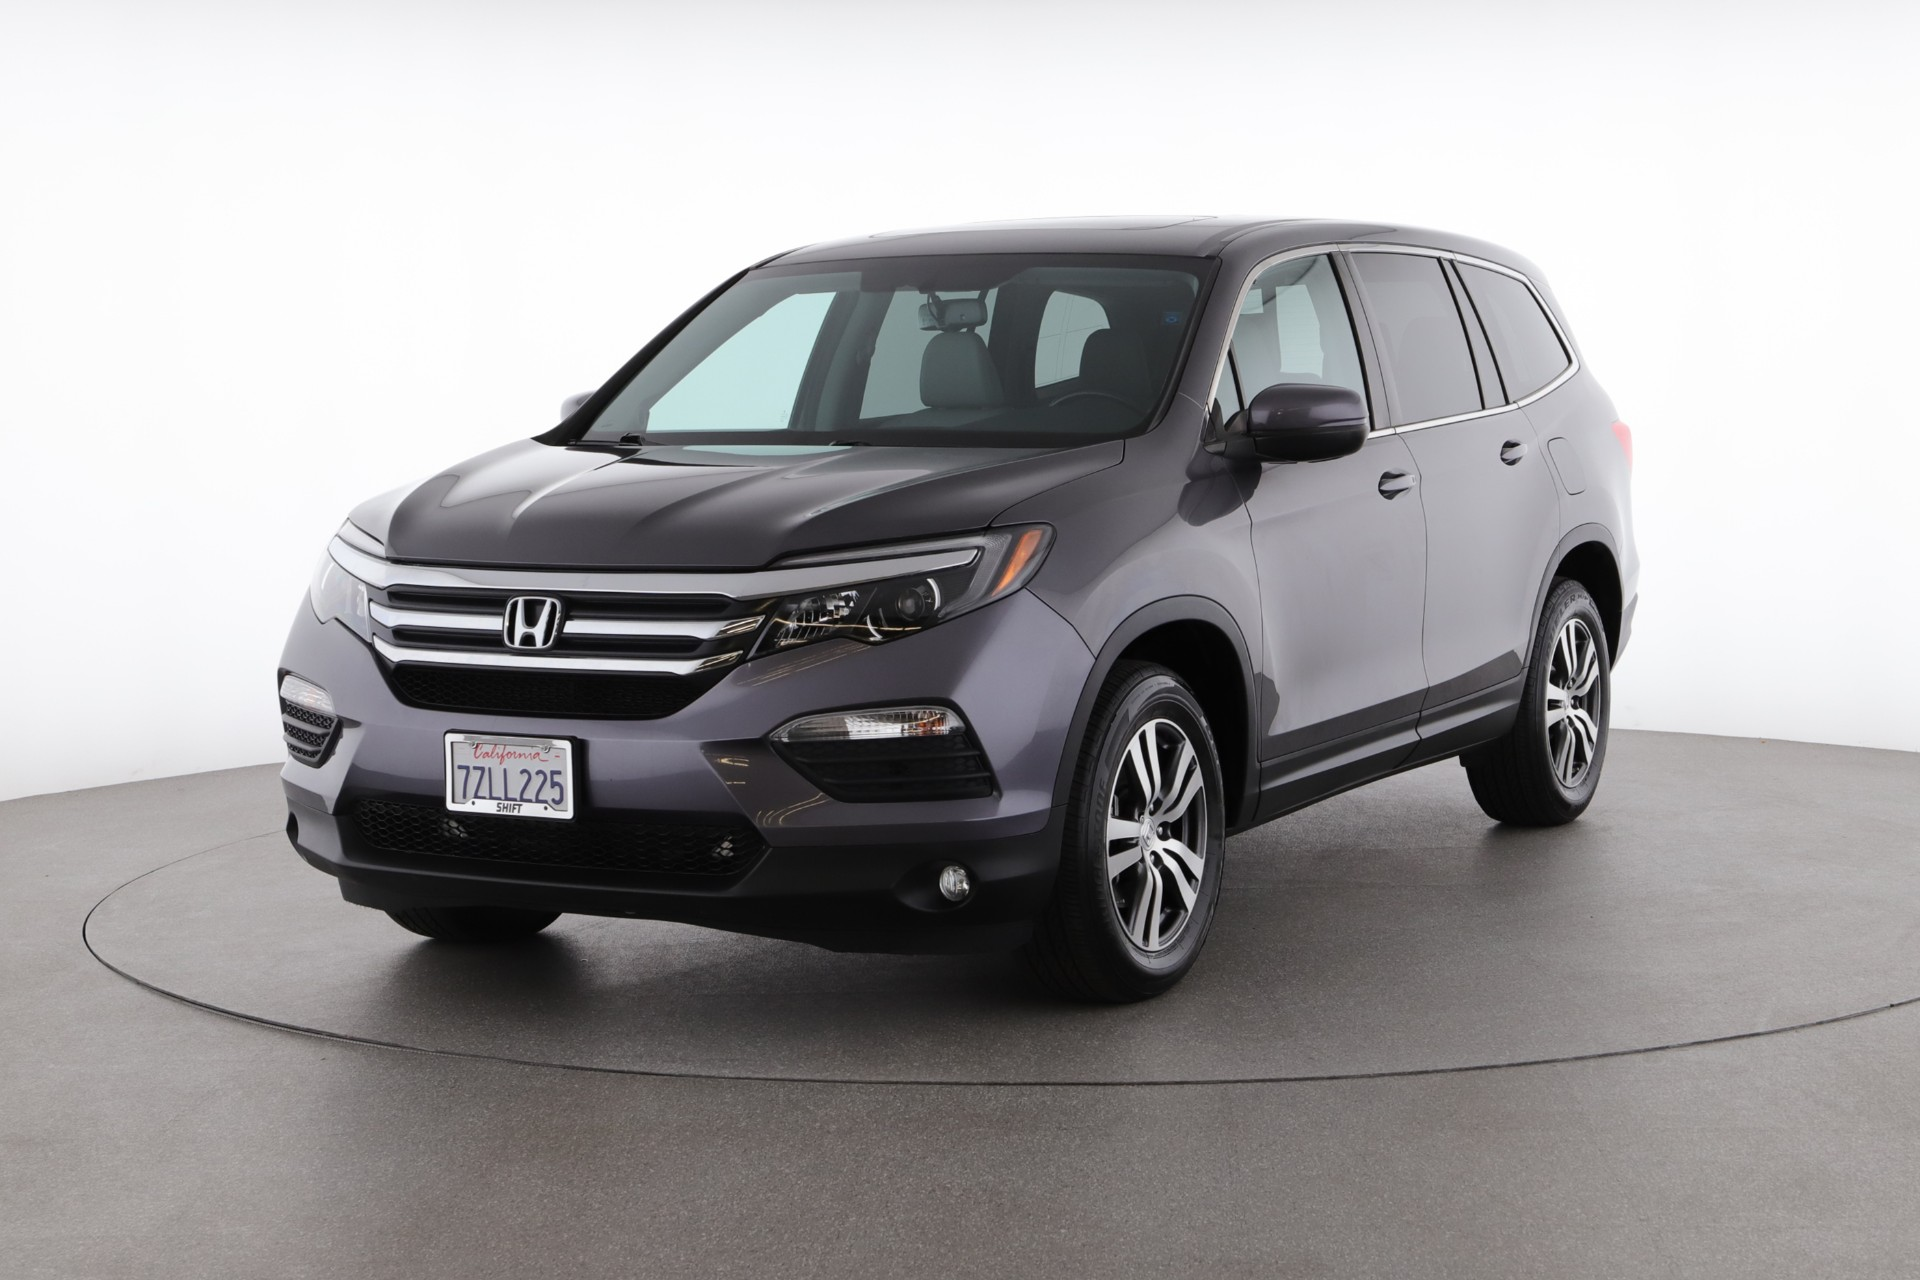 2017 Honda Pilot EX-L (from $26,950)